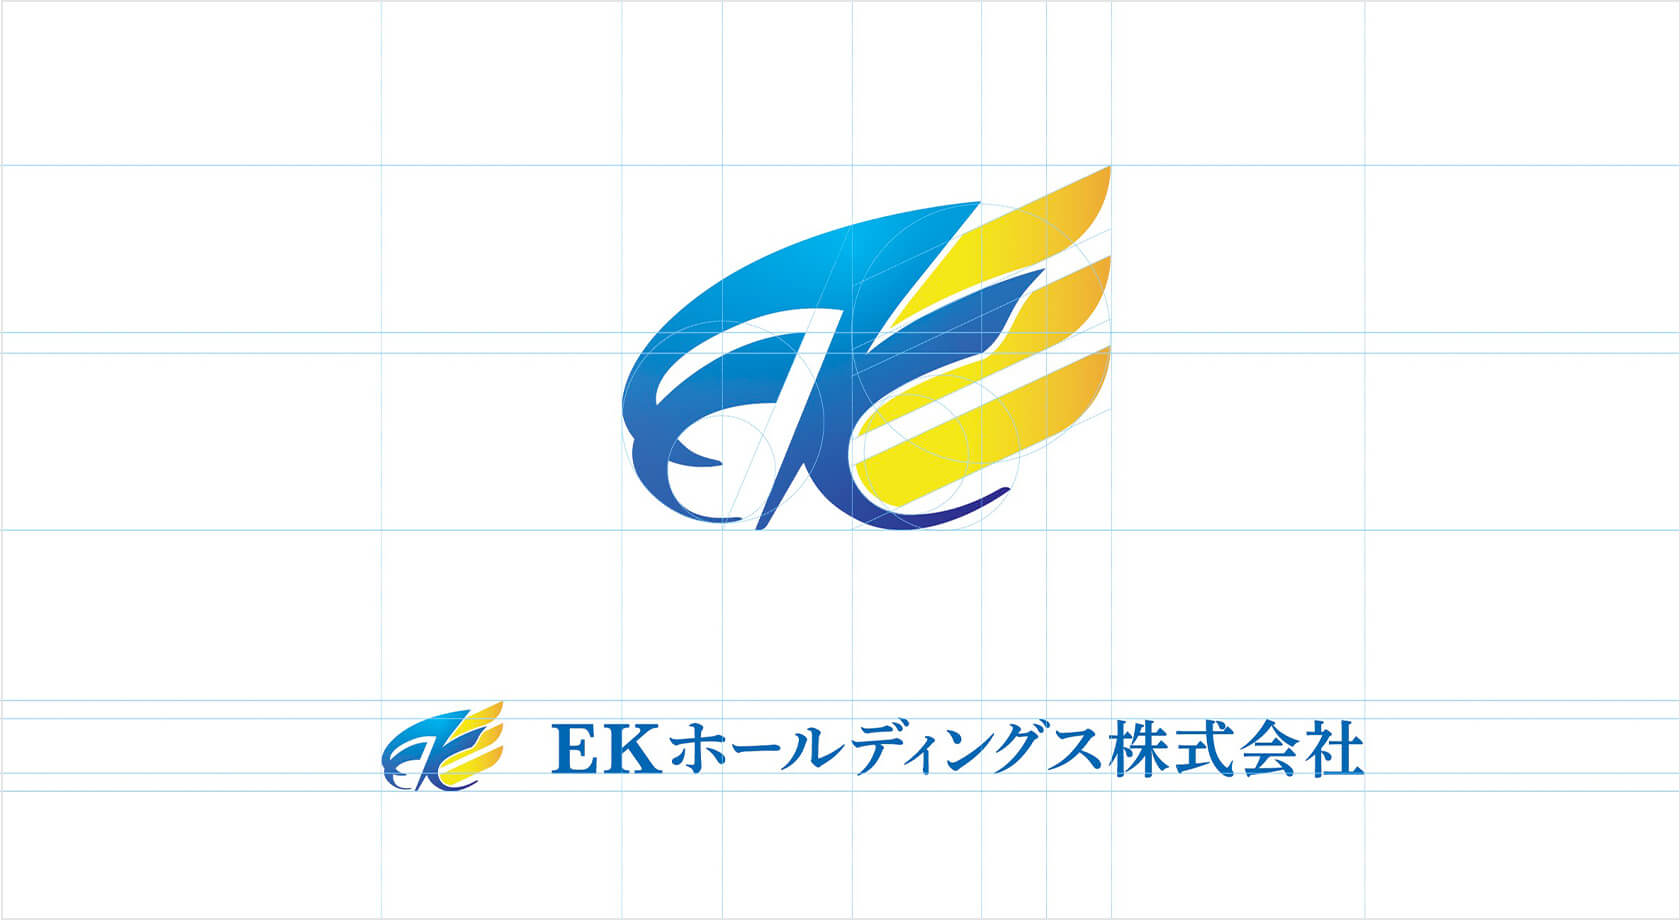 EKホールディングス株式会社 / ロゴ・シンボルマーク制作